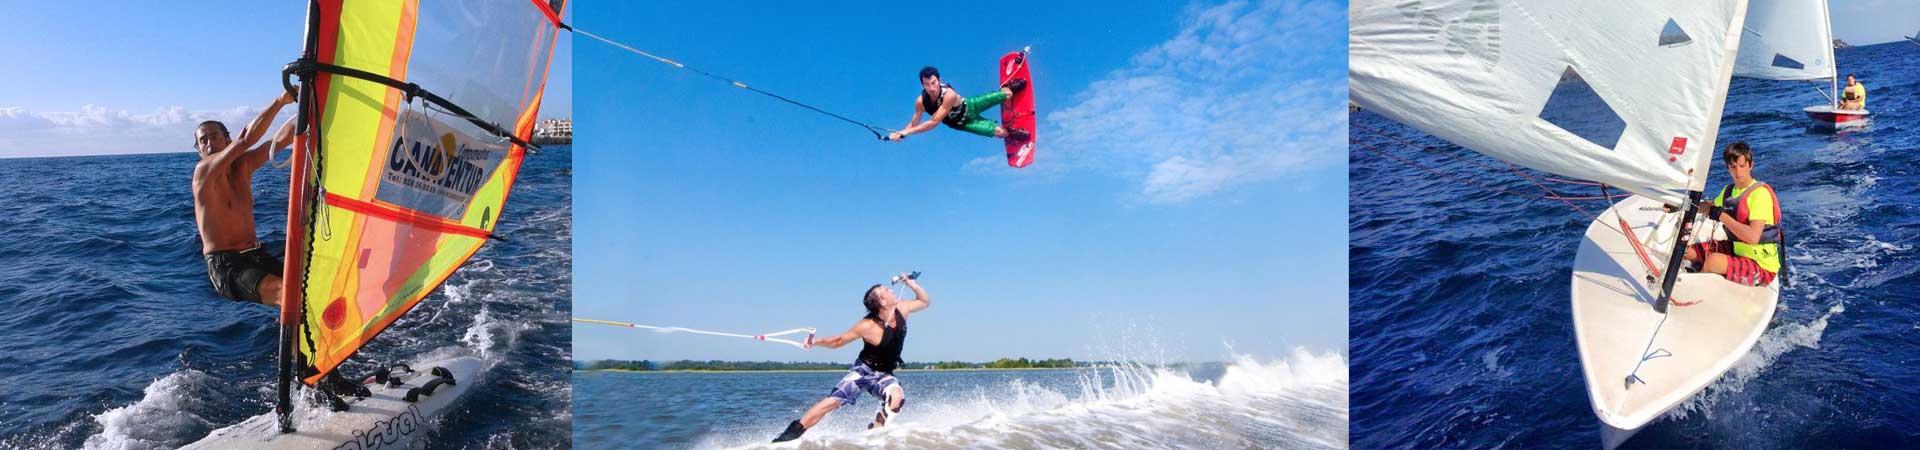 https://www.goodmorningtenerife.com/wp-content/uploads/2015/07/03_slide_actividades-nauticas-1920x450-1.jpg